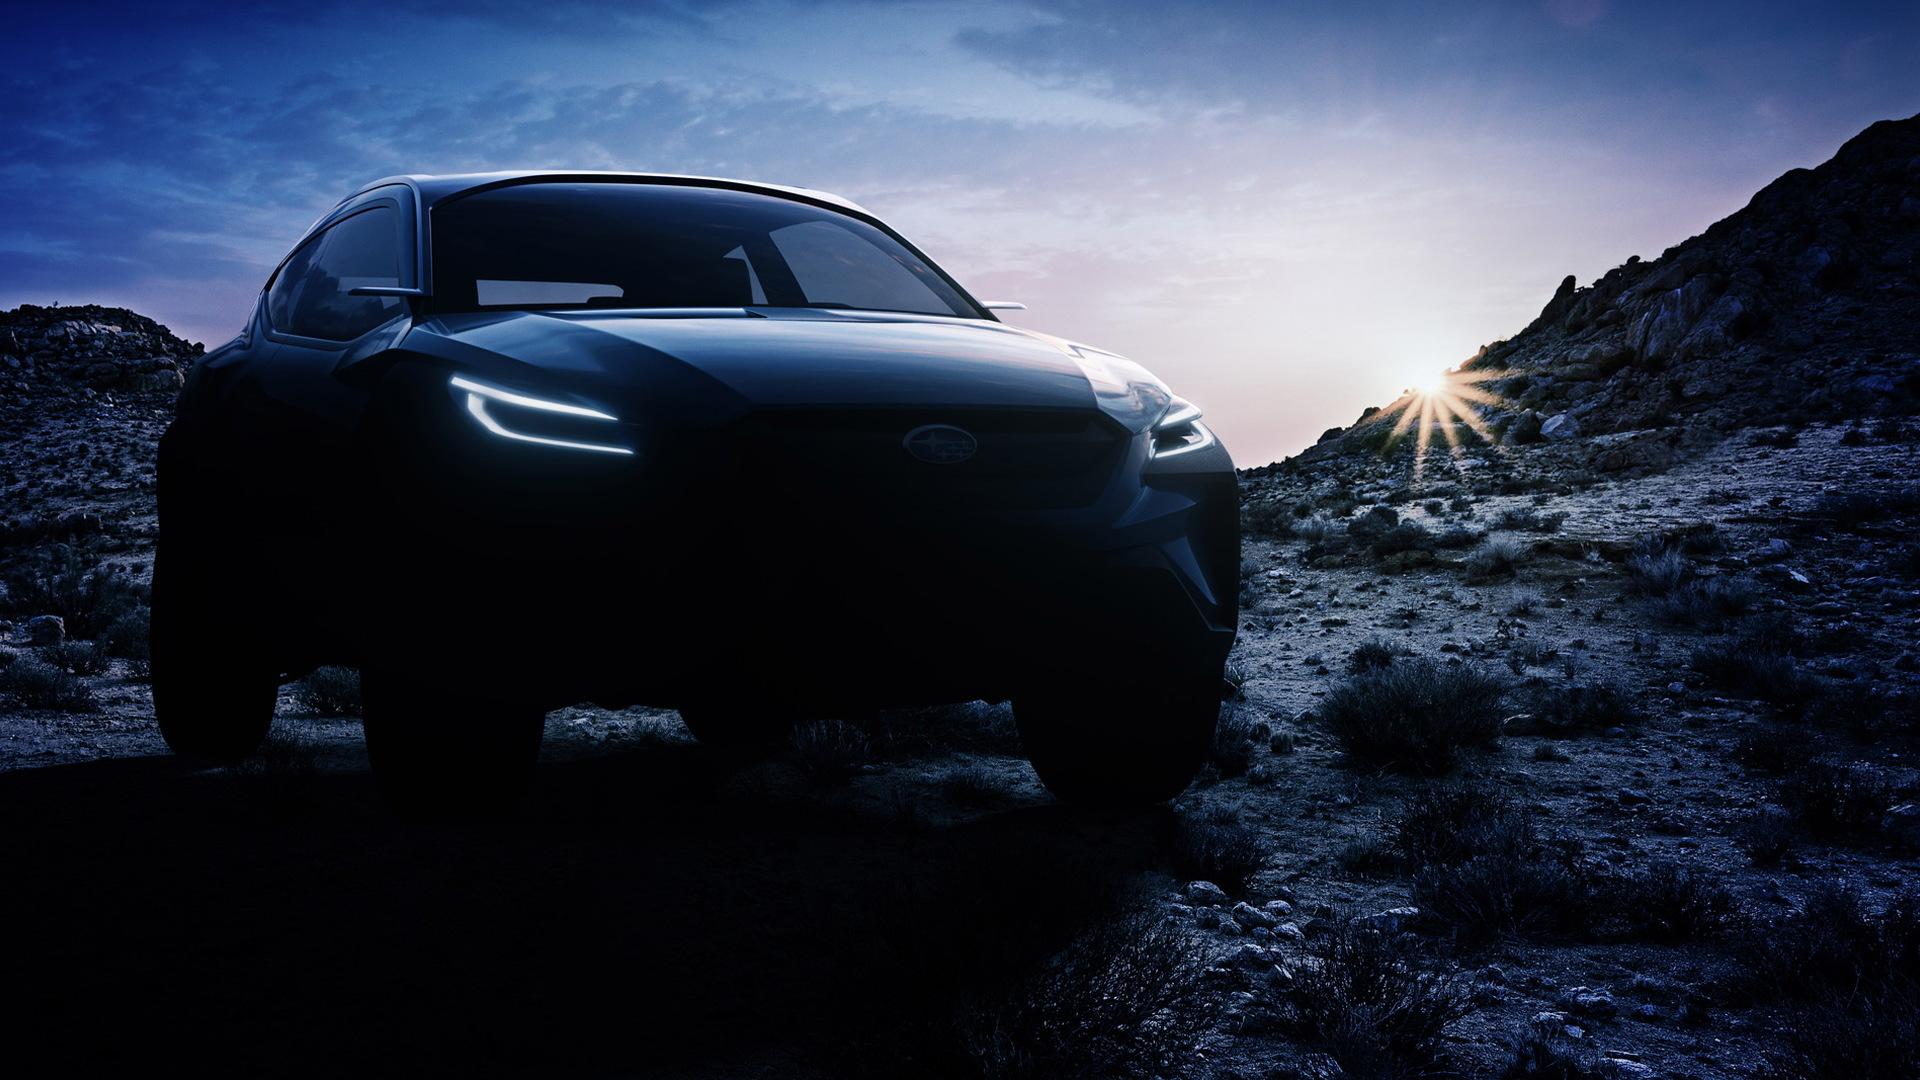 Teaser for Subaru Viziv Adrenaline Concept debuting at 2019 Geneva auto show